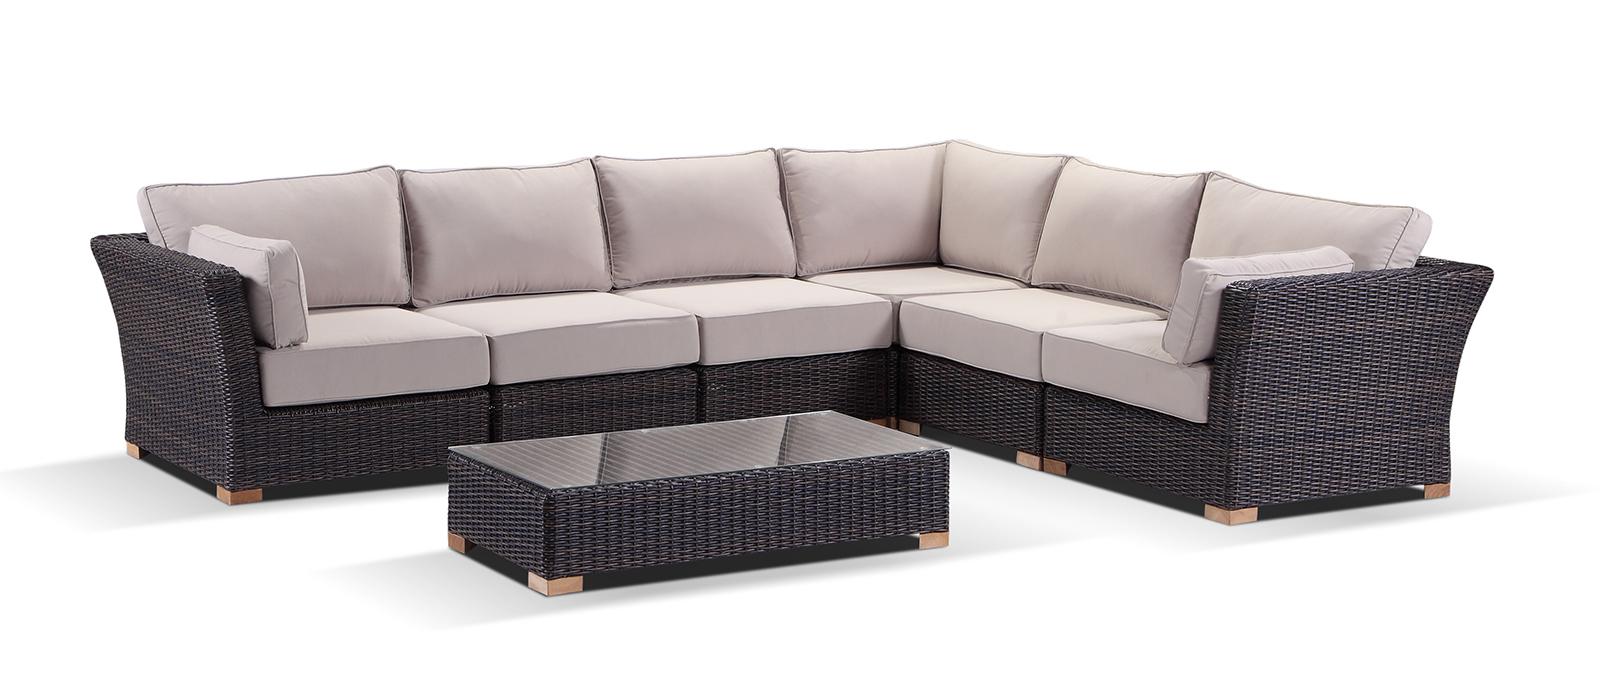 Coco 5 Seater Corner Modular Outdoor Sofa Set